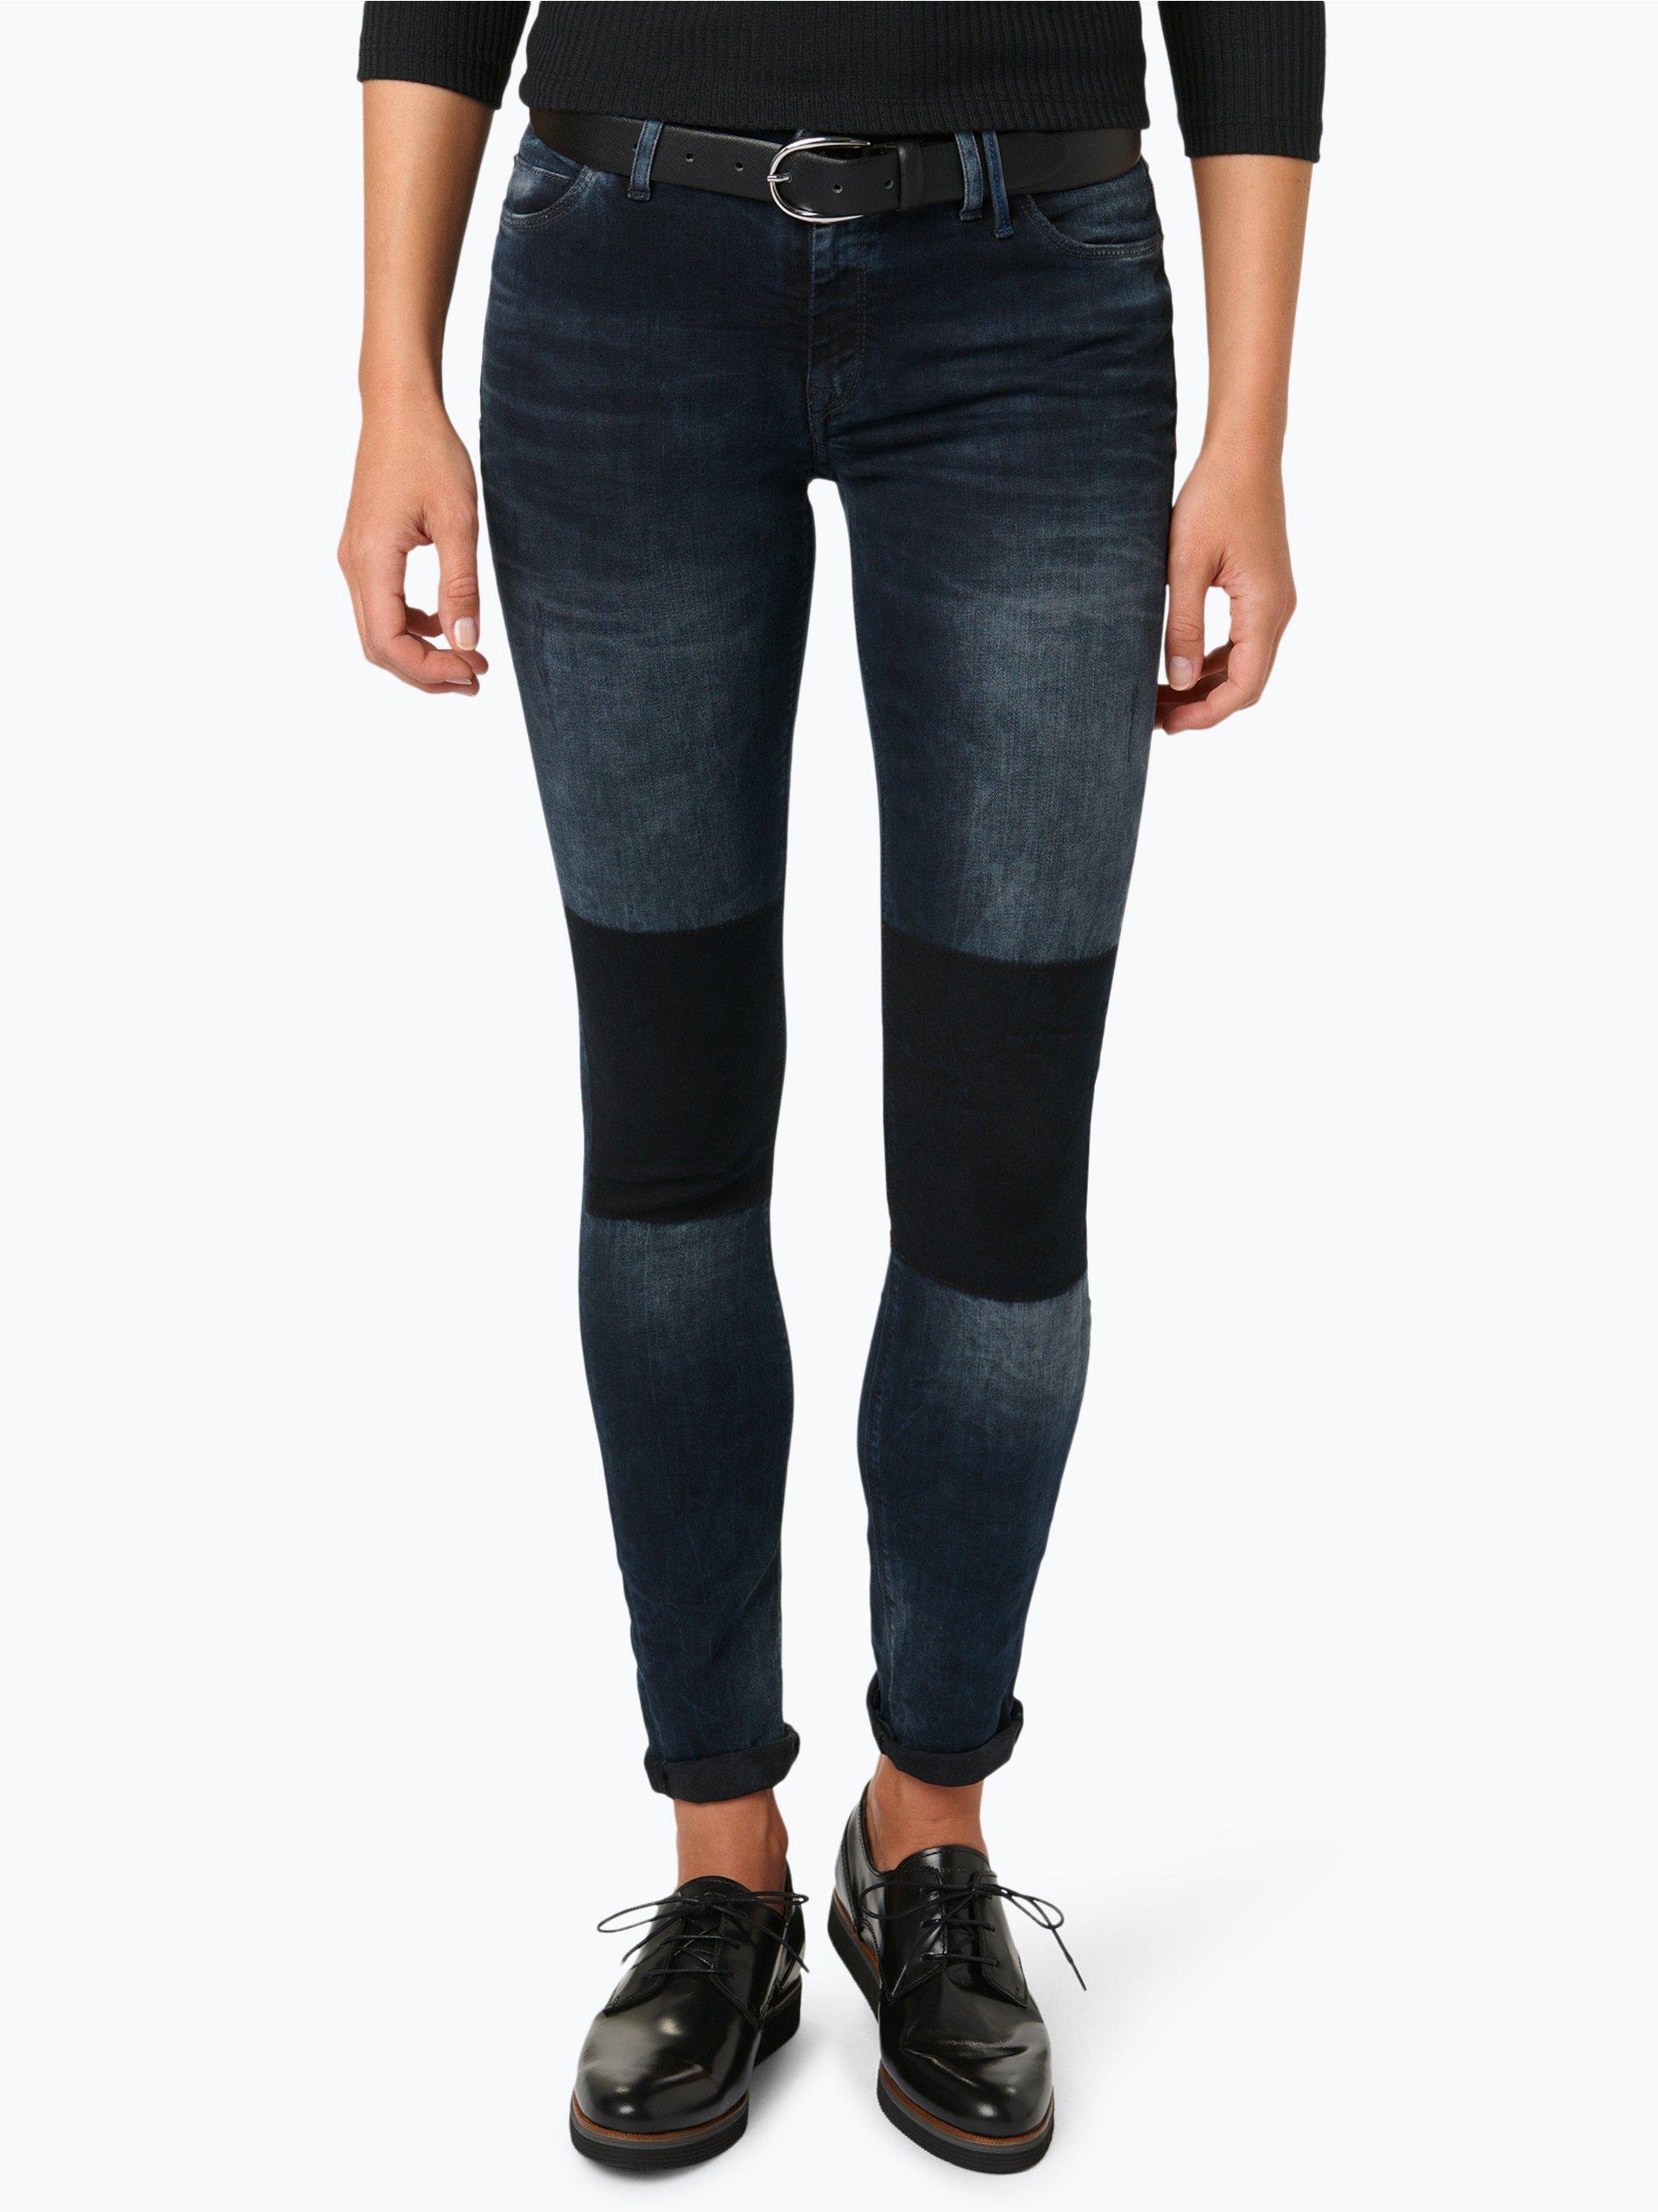 marc o 39 polo denim damen jeans alva blau uni online kaufen peek und cloppenburg de. Black Bedroom Furniture Sets. Home Design Ideas